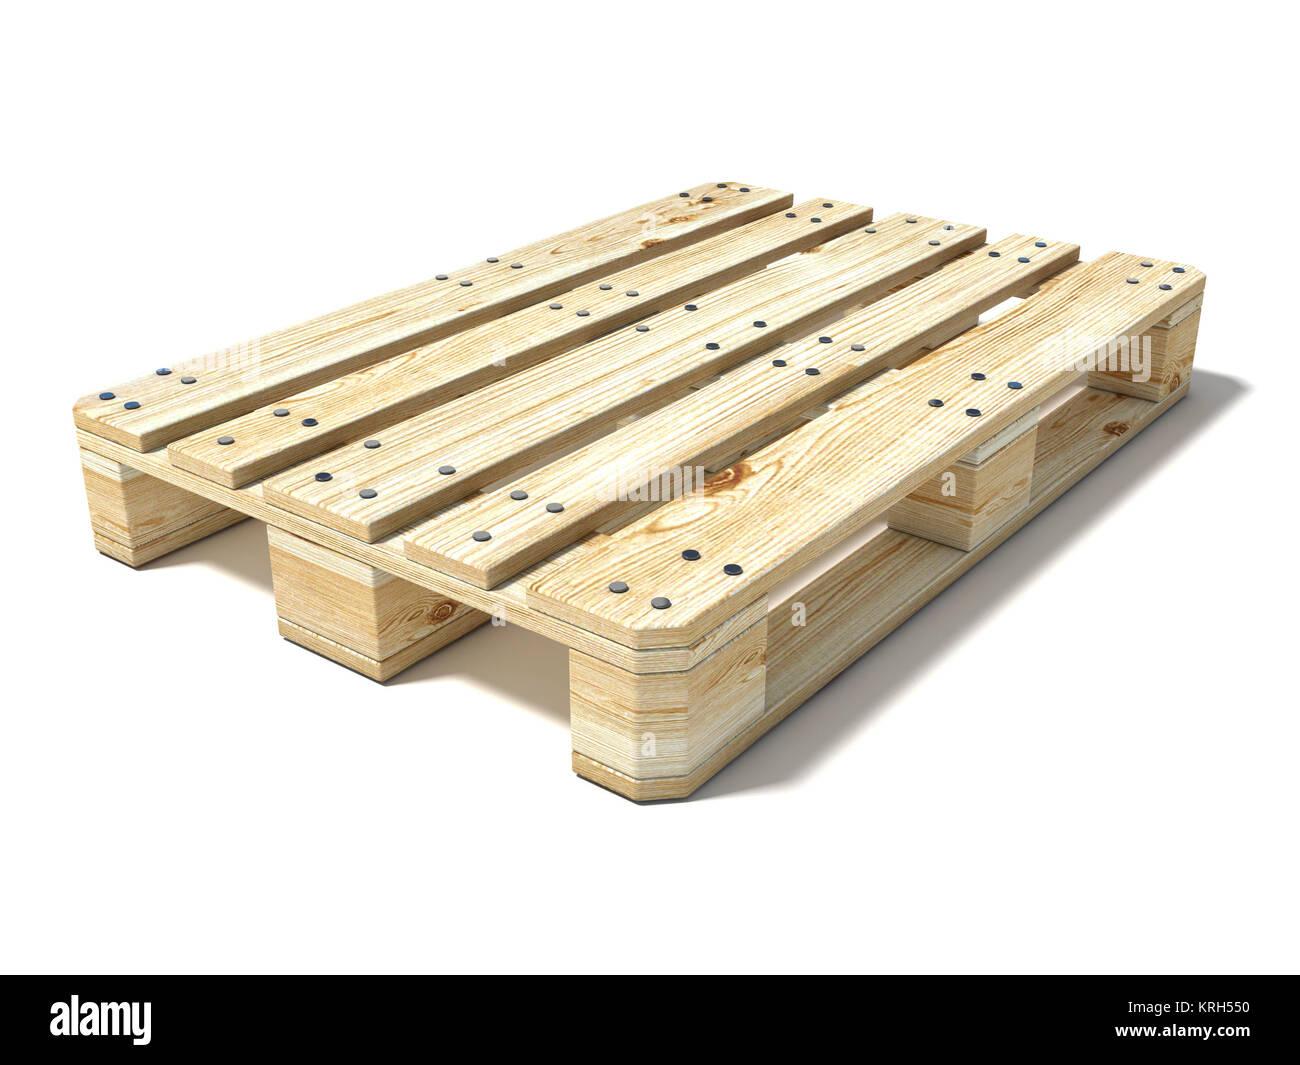 Euro Pallet 3D Stock Photo 169407644